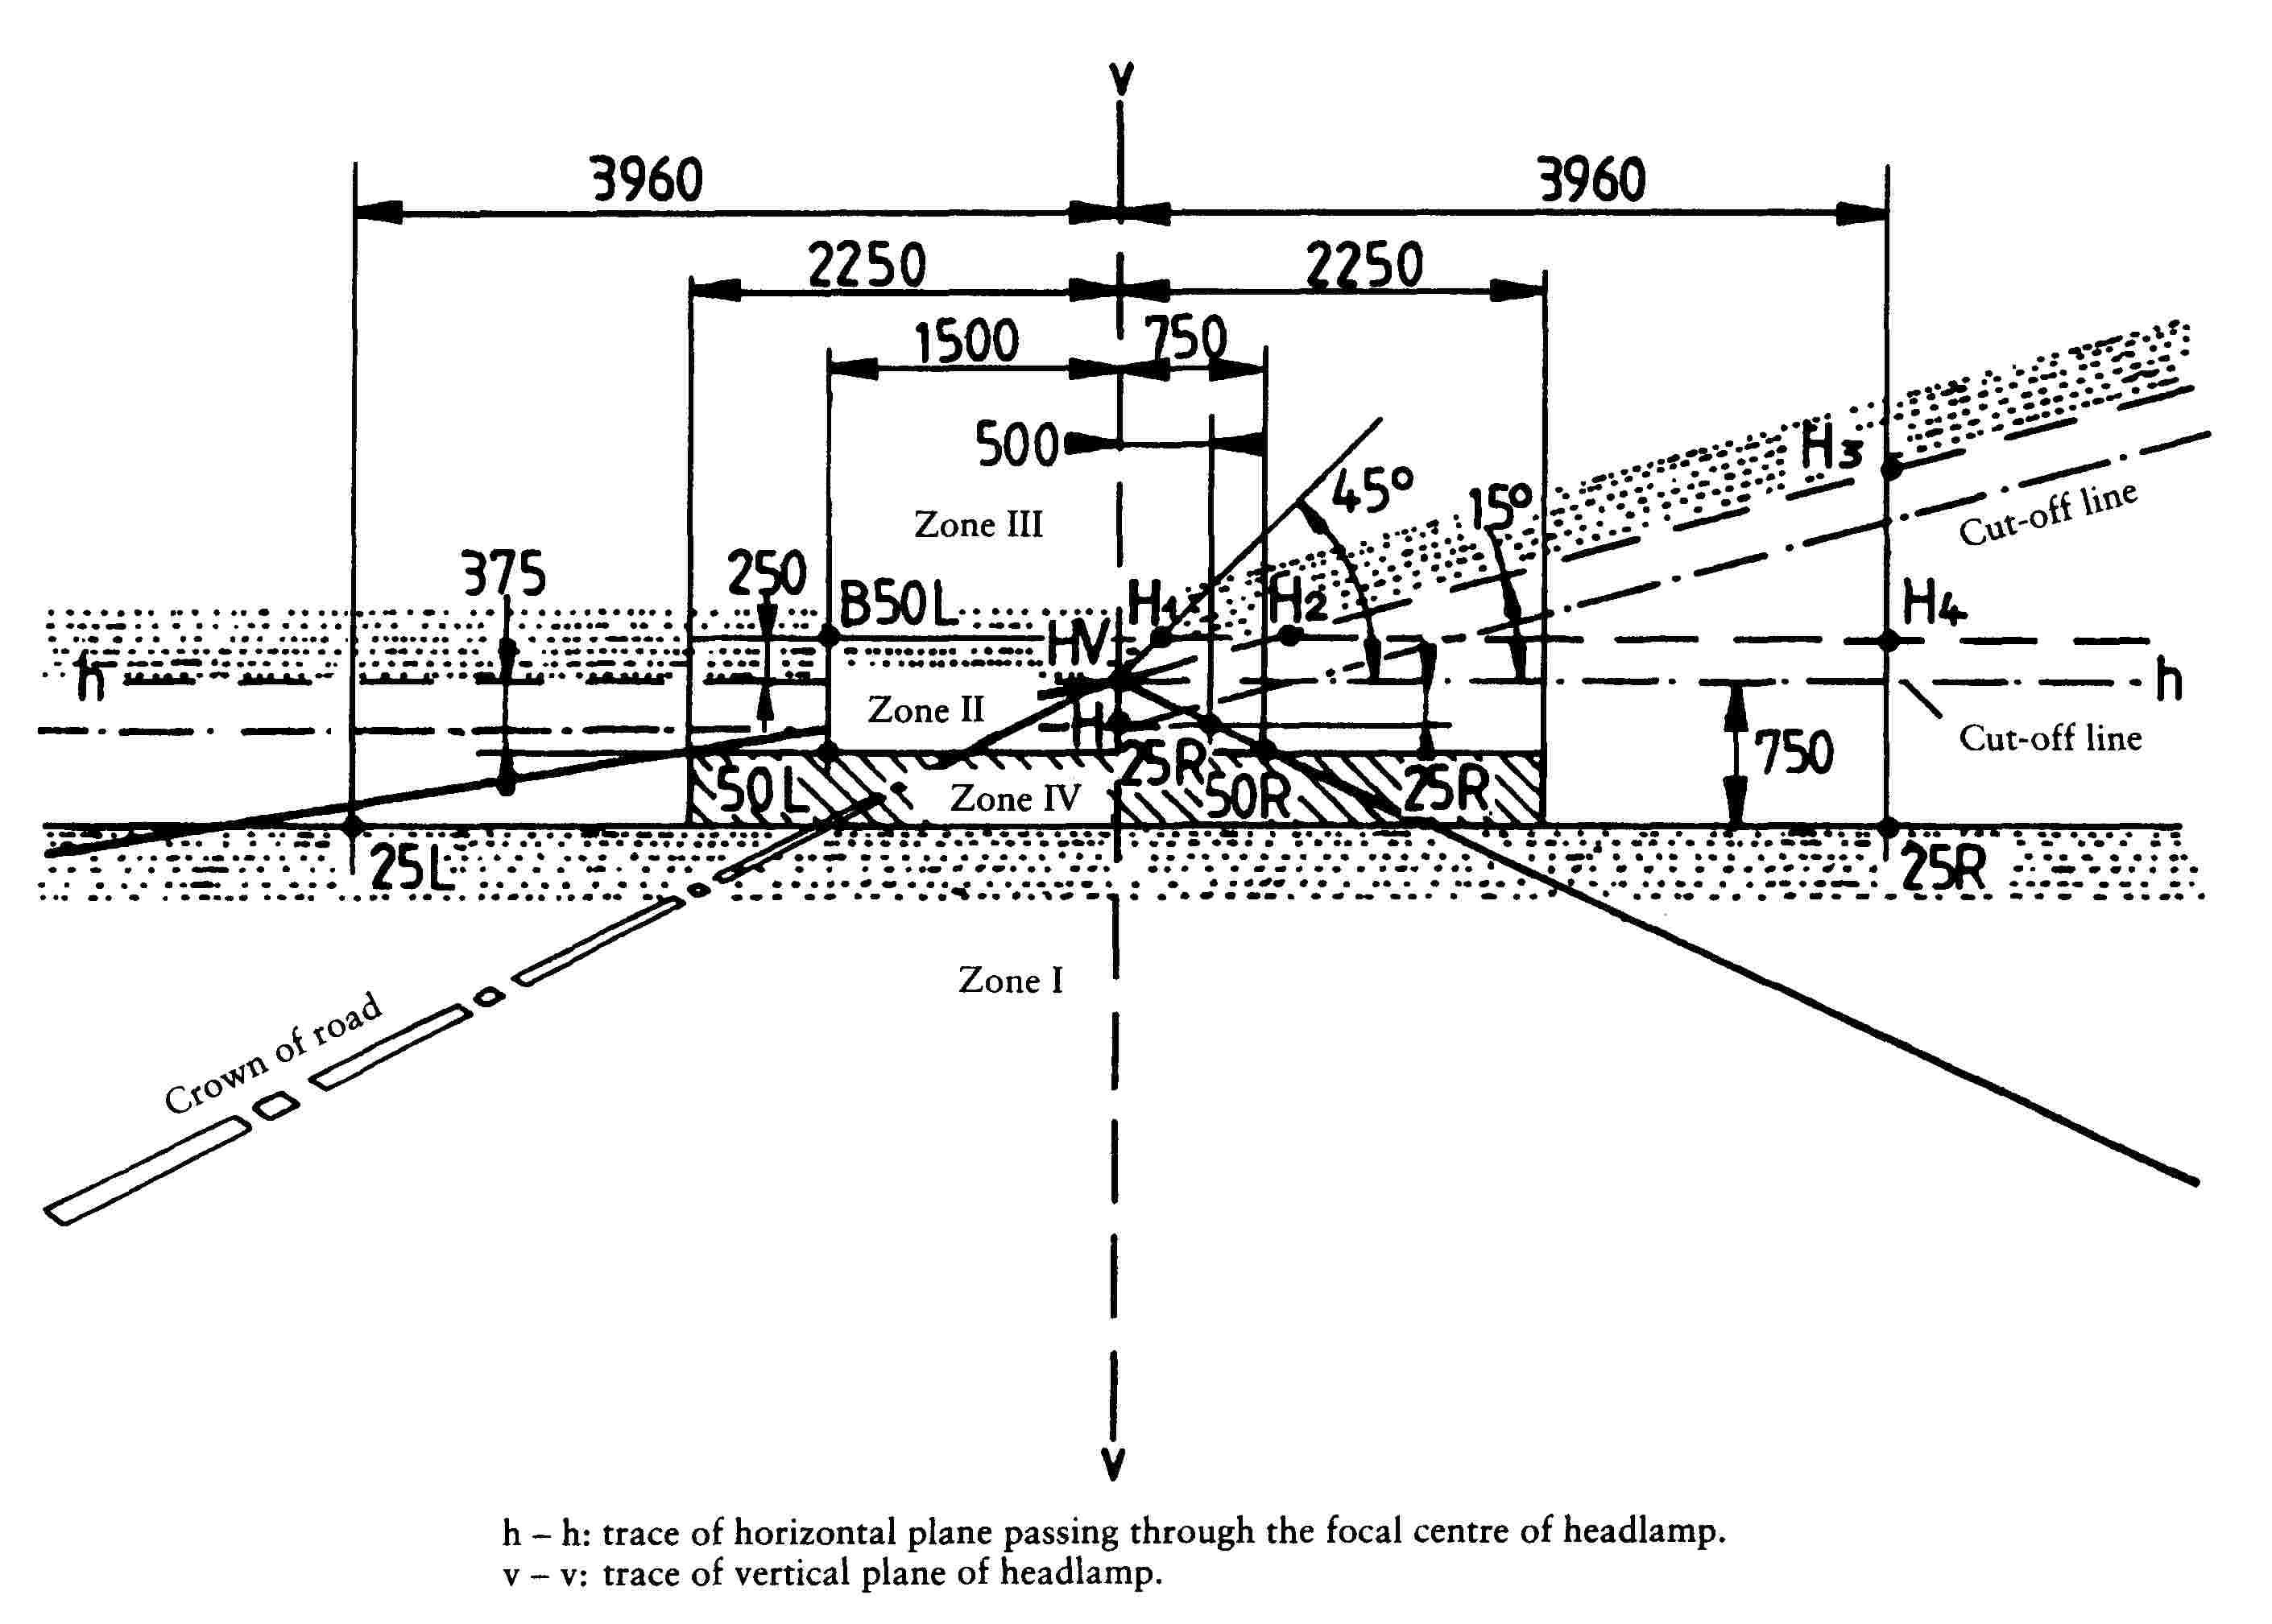 Eur Lex 01997l0024 20131211 En Solder Resist Composition And Printed Circuit Boards Google Patents Image